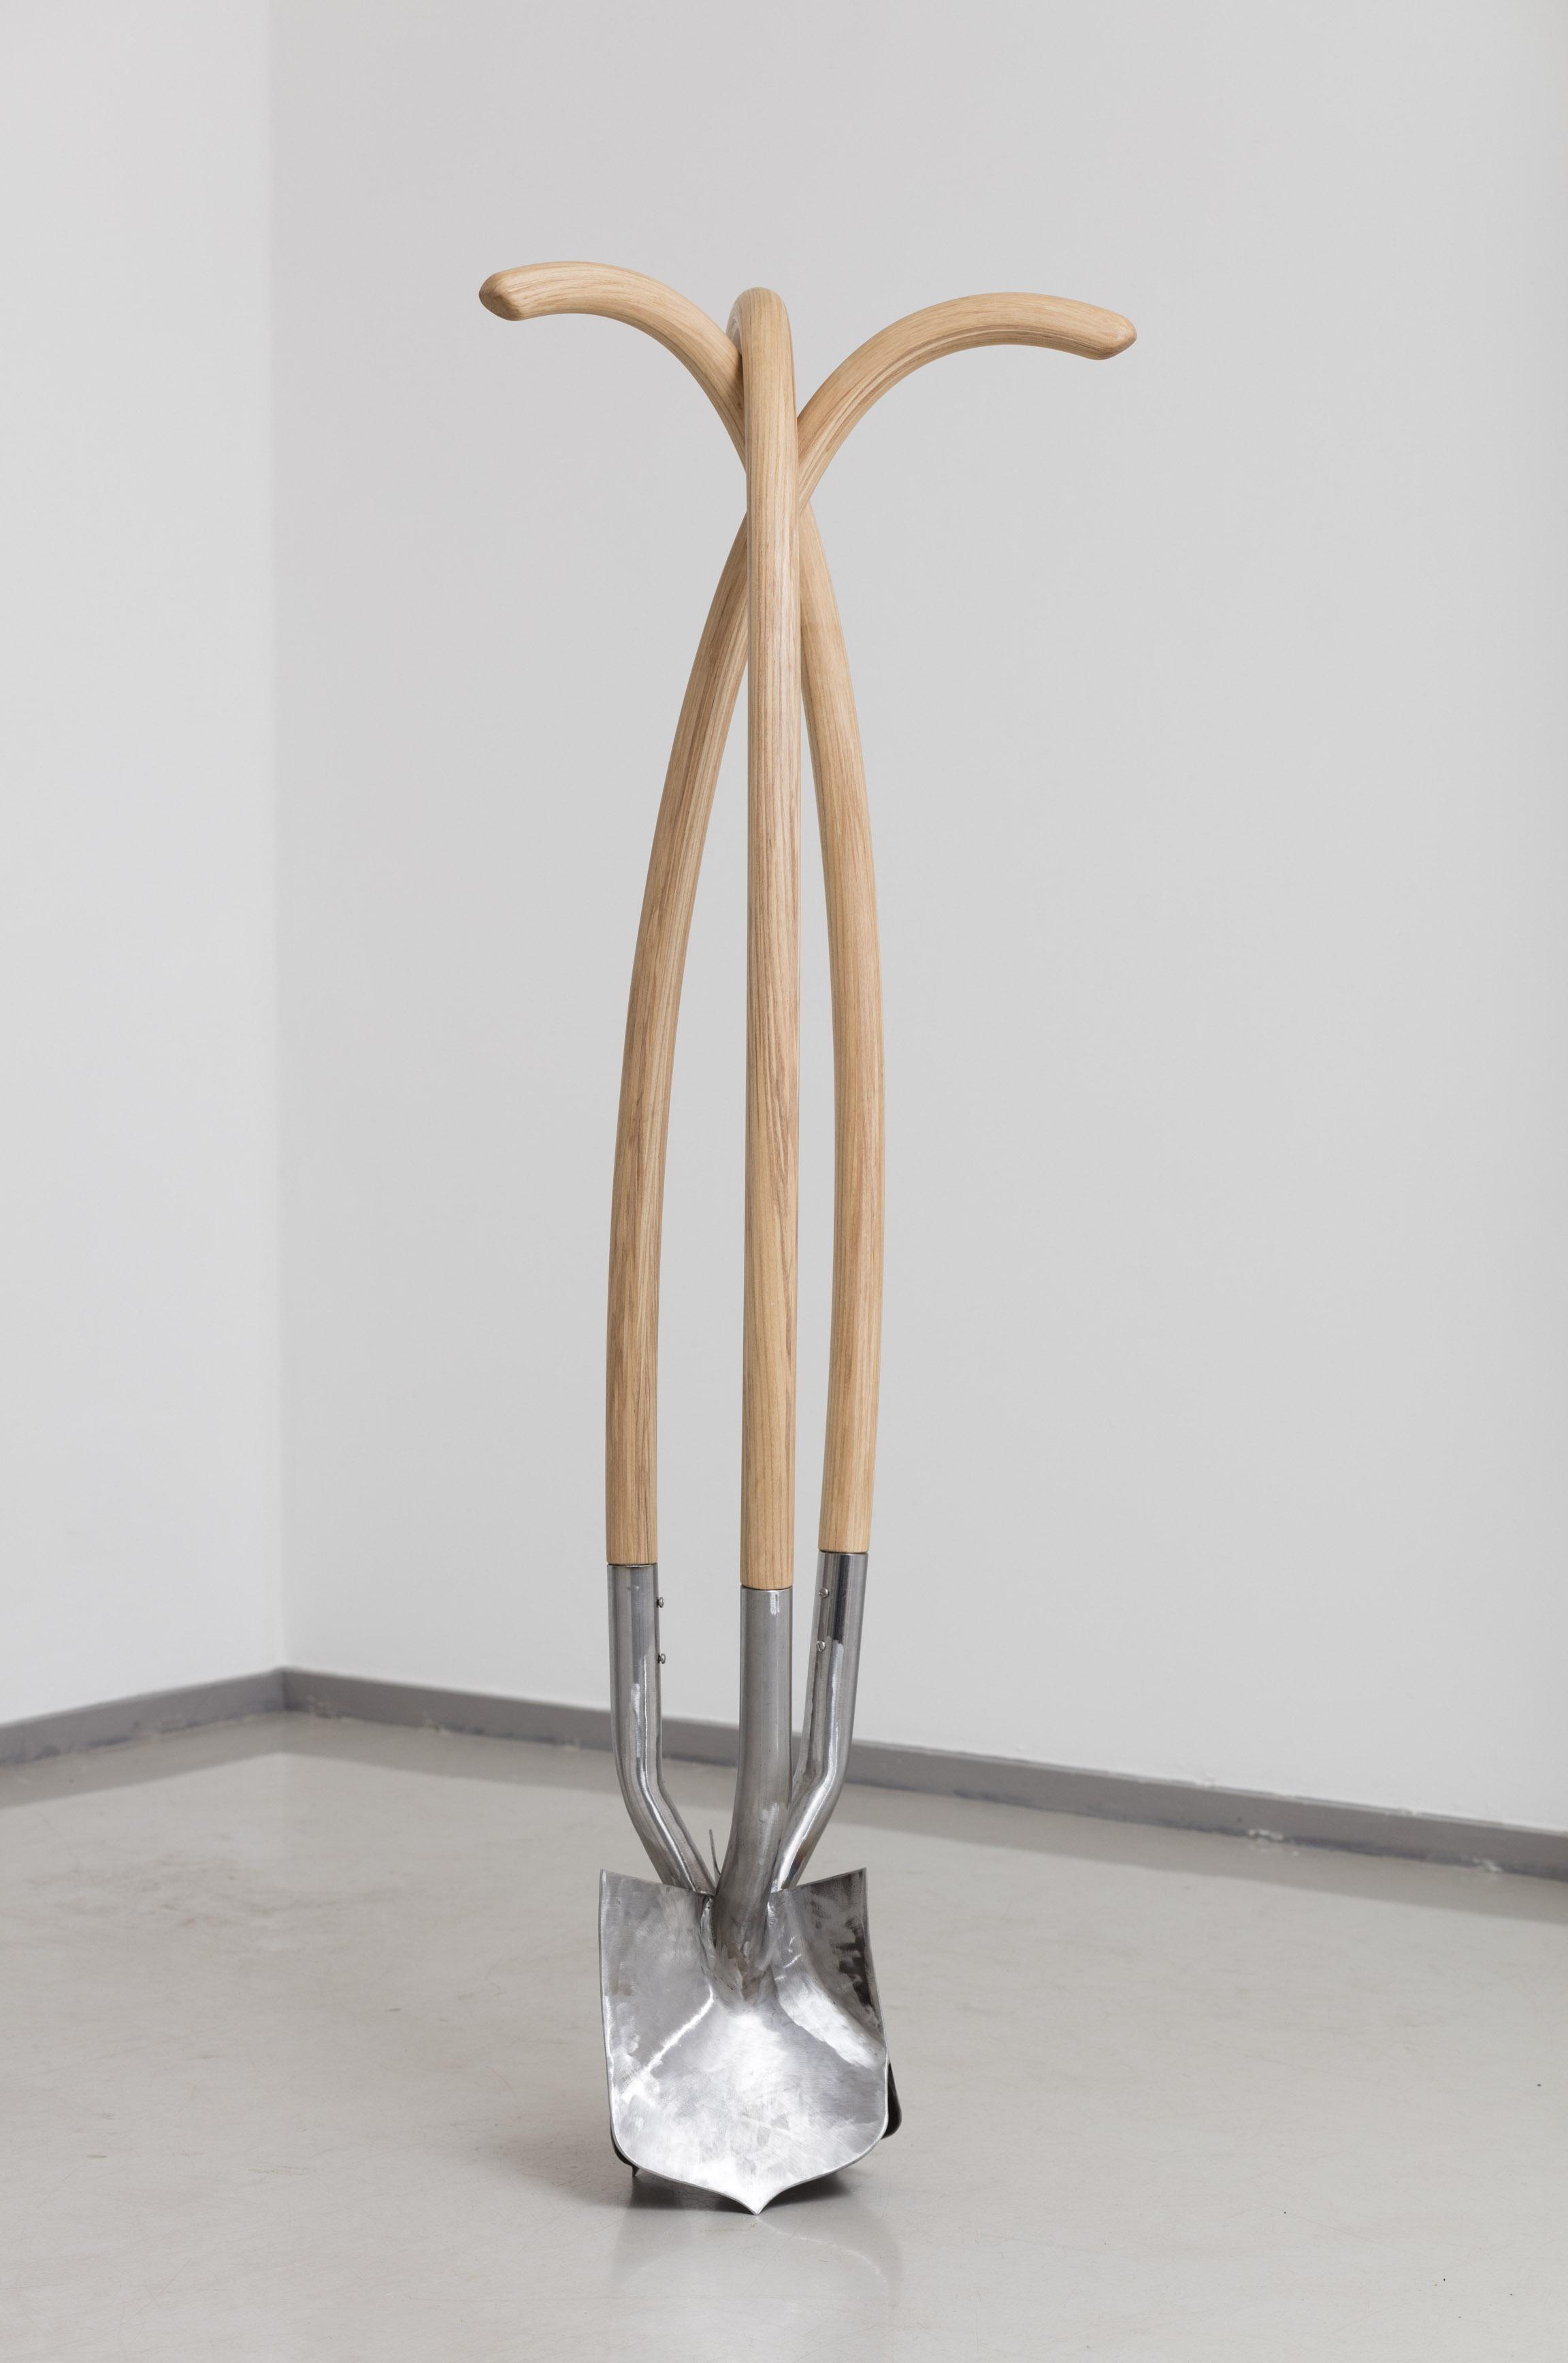 Tool II, Ash, oak and steel, 2017